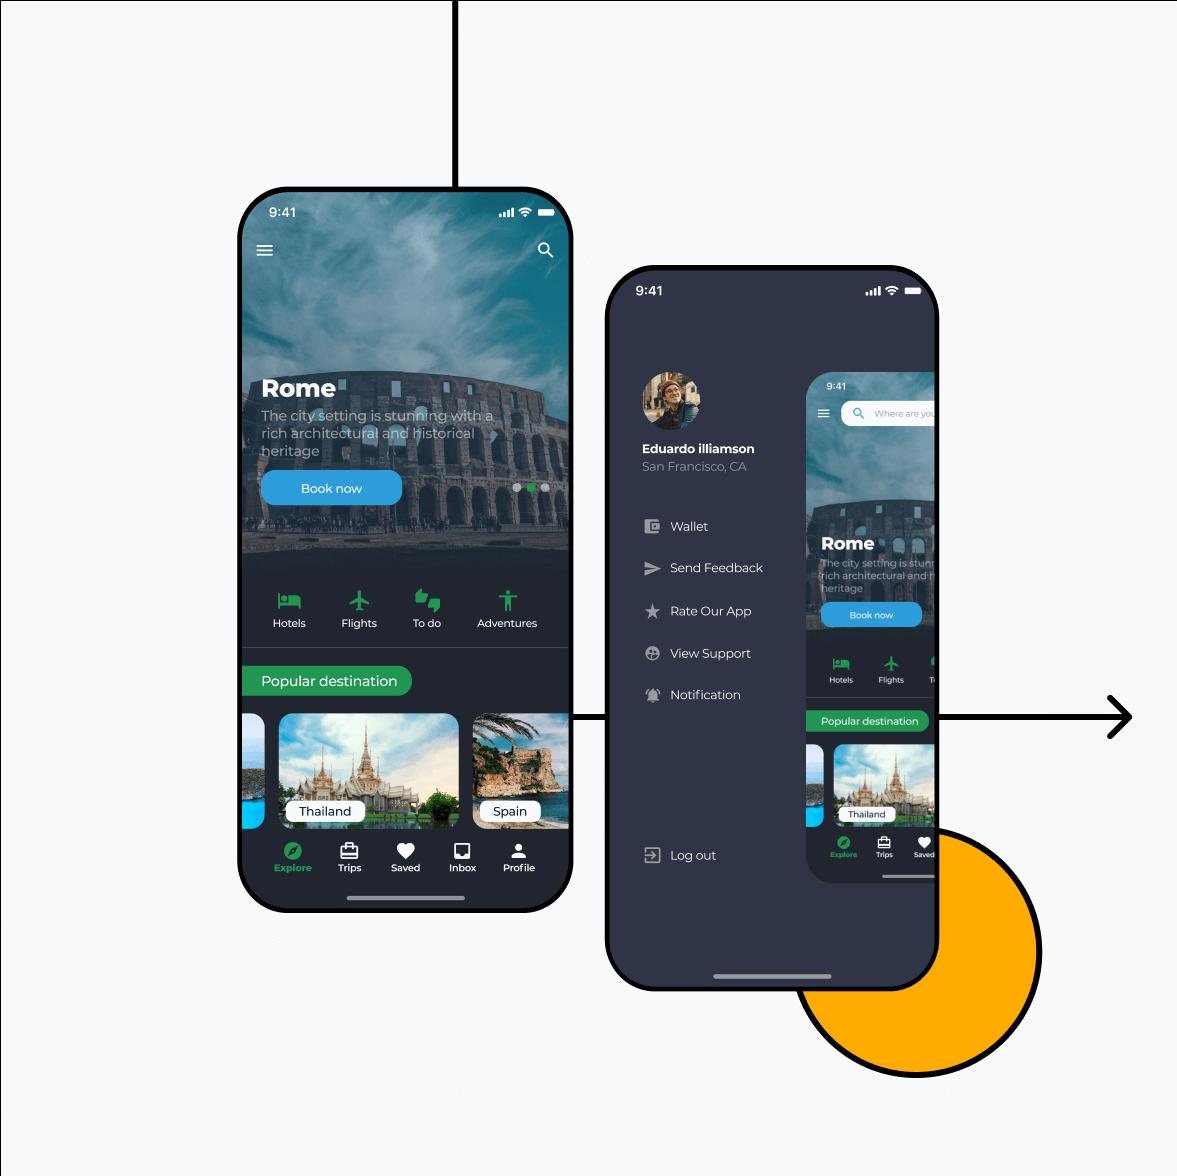 Itinerary app screens